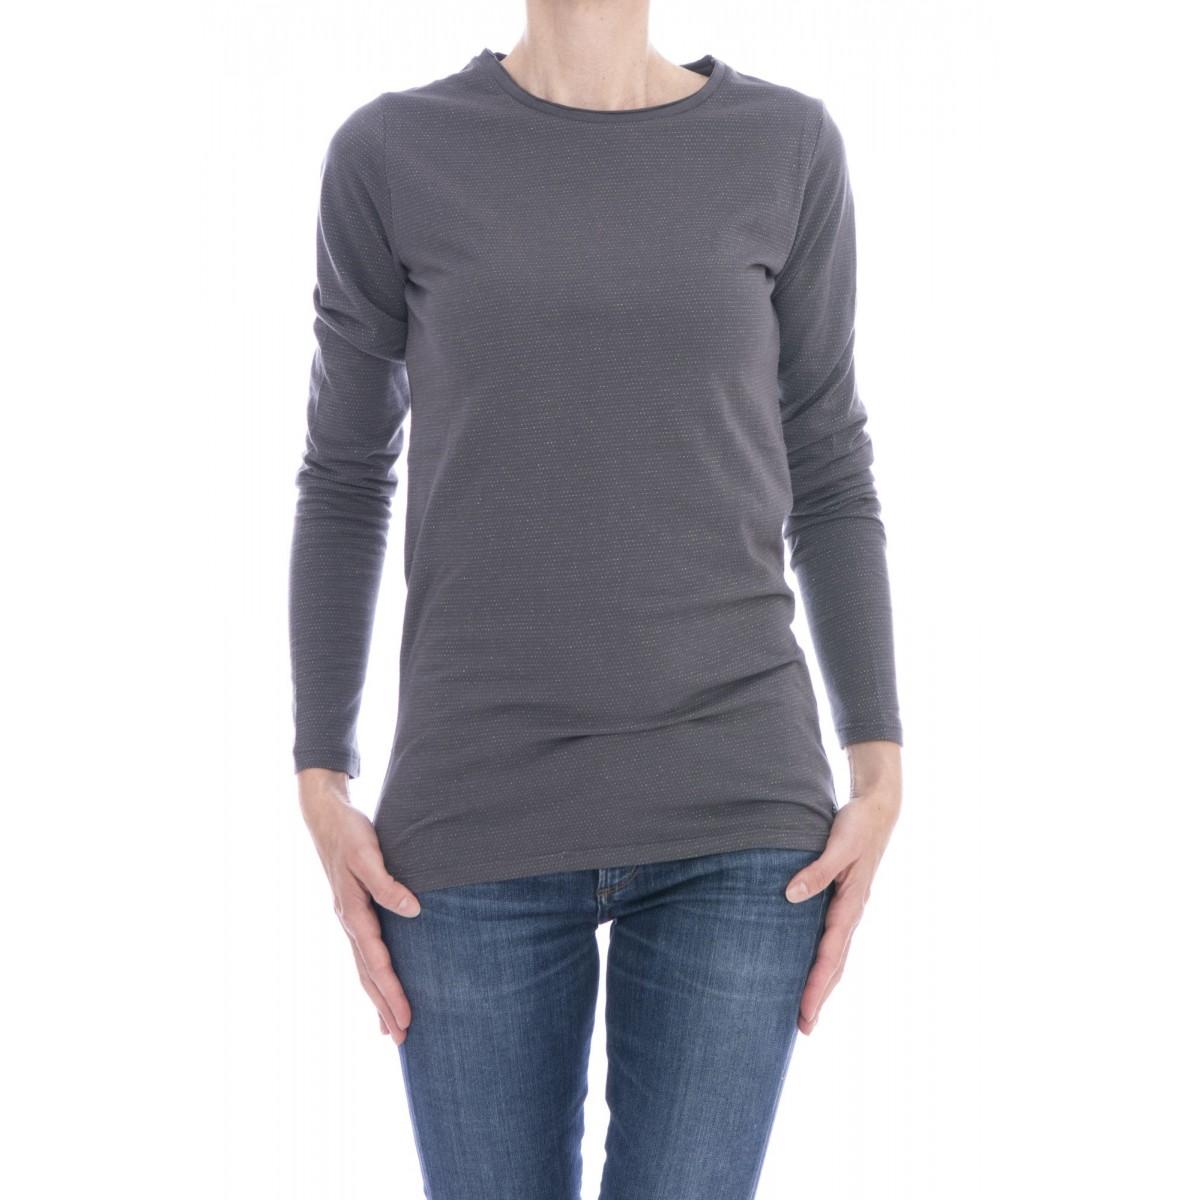 T-shirt 40 weft - Zeudy 9210